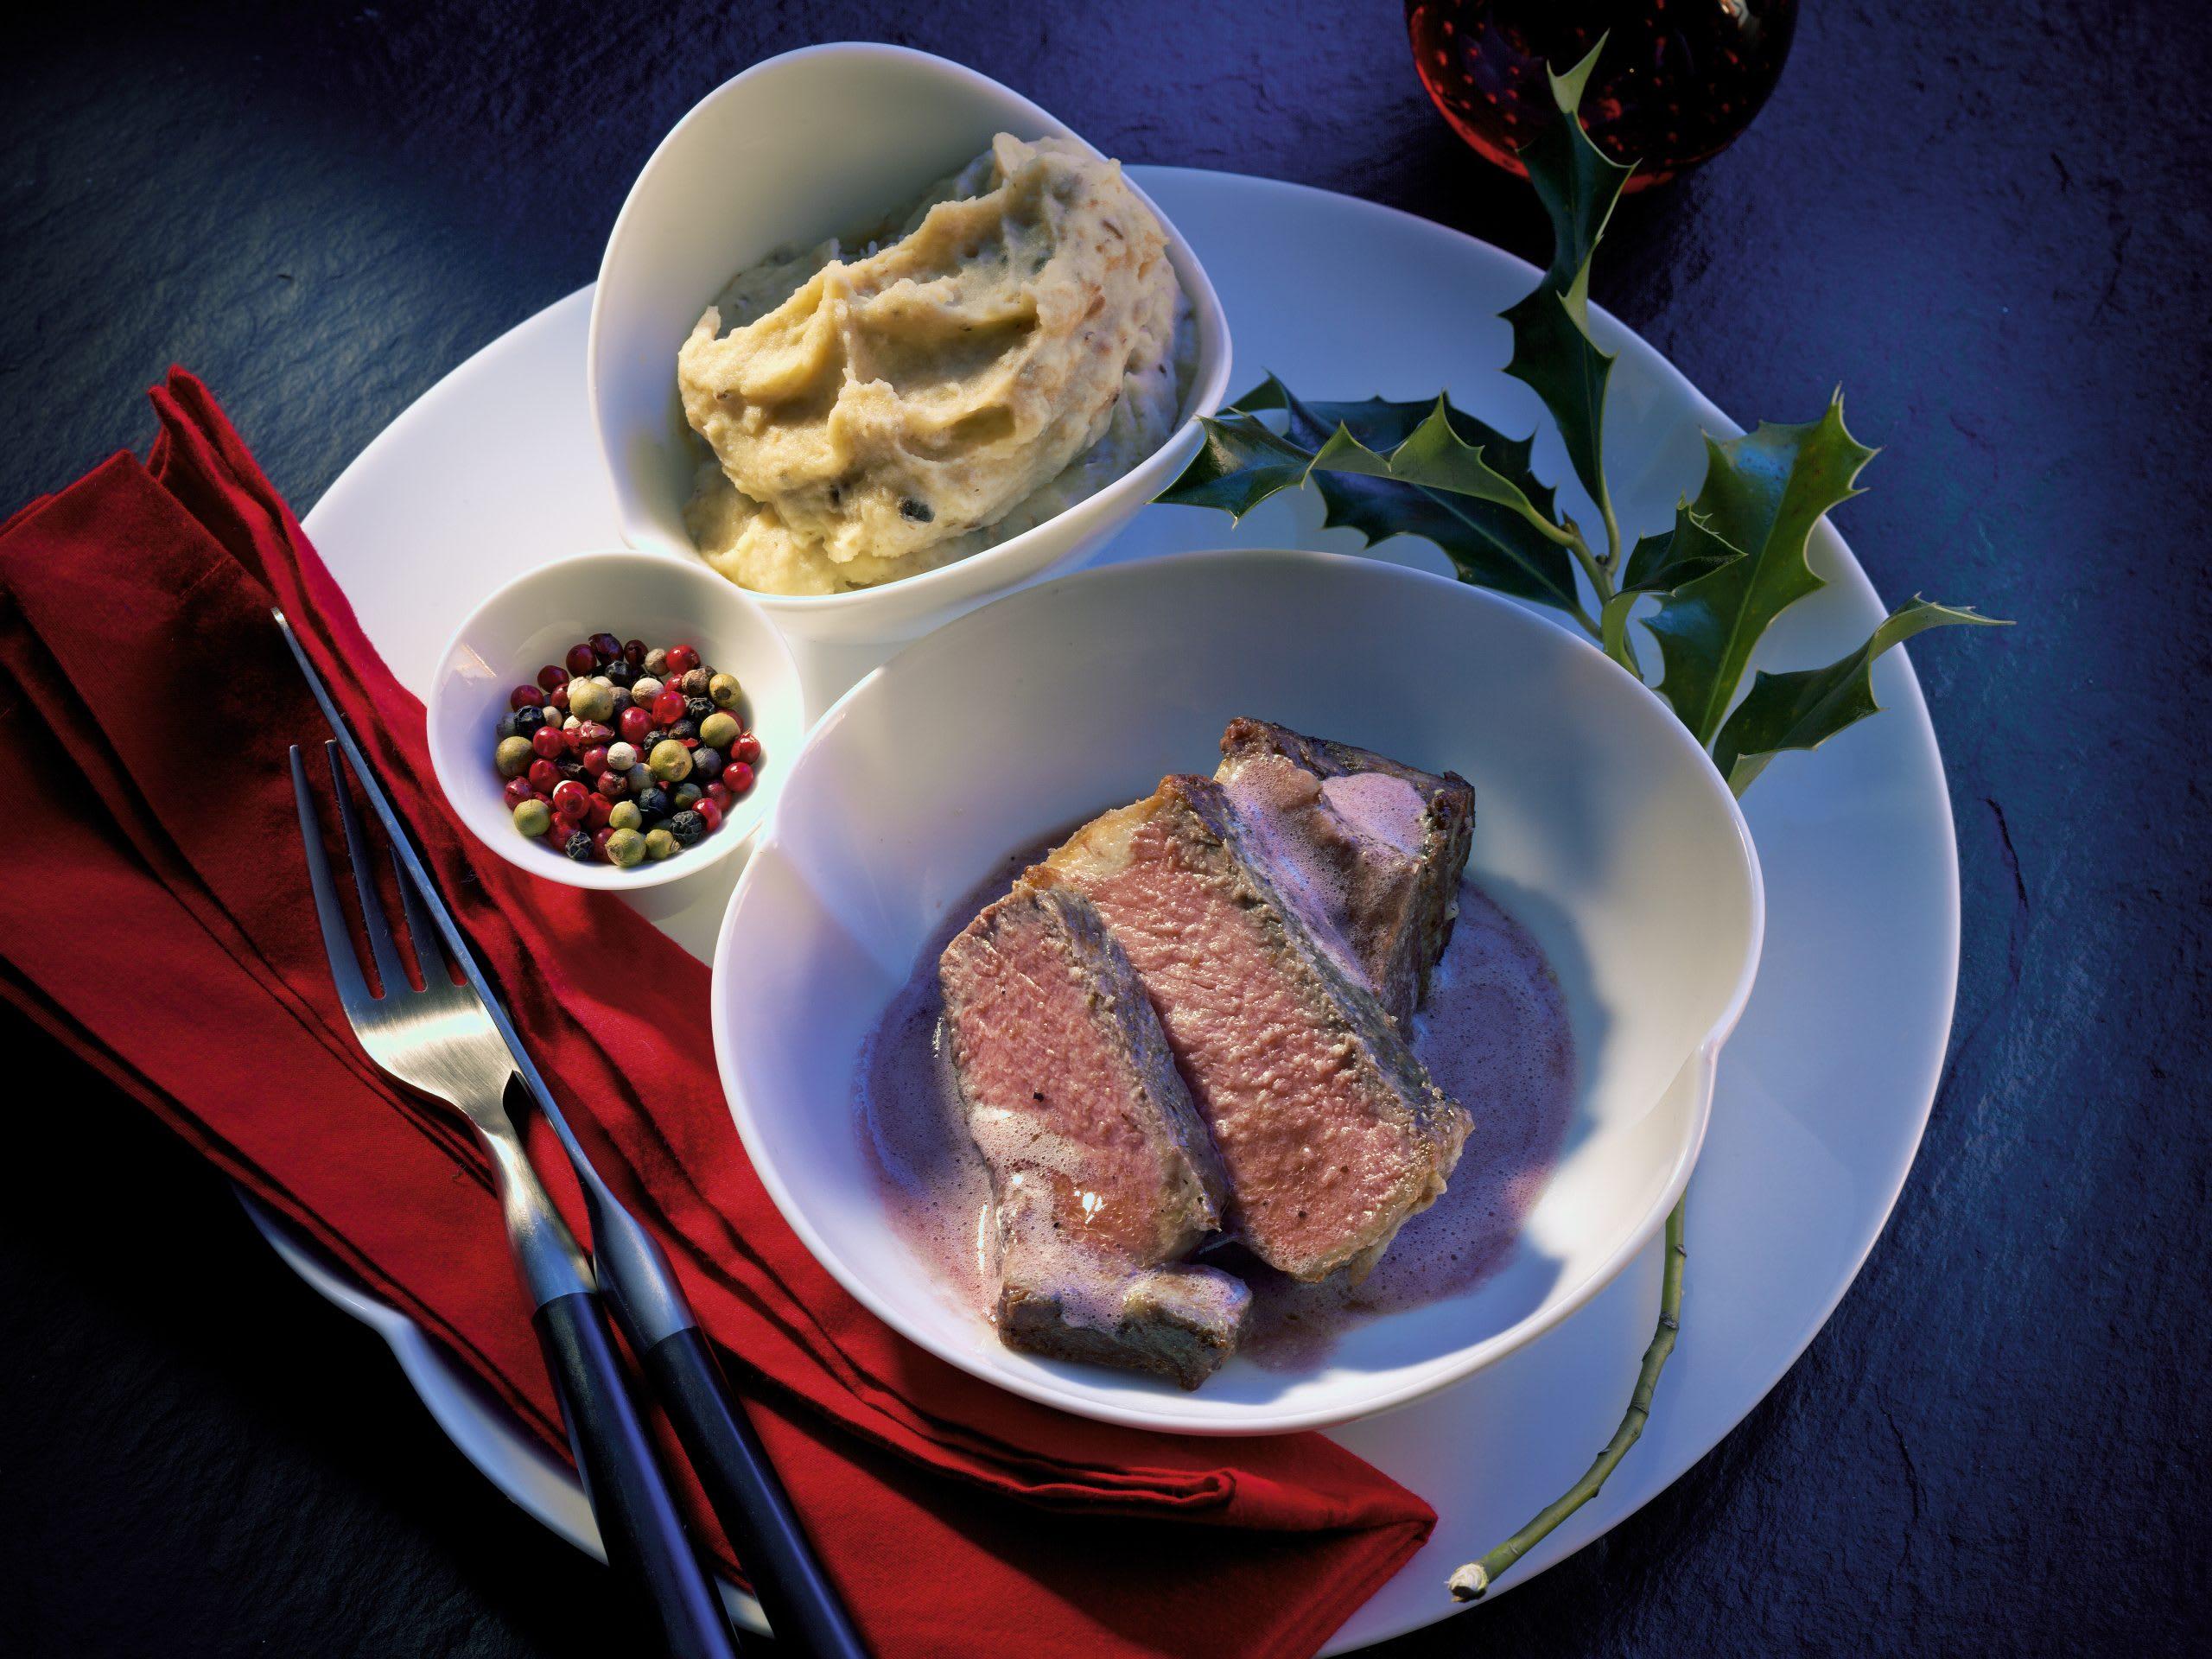 Entrecôte double mit Rotwein-Pfeffer-Butter